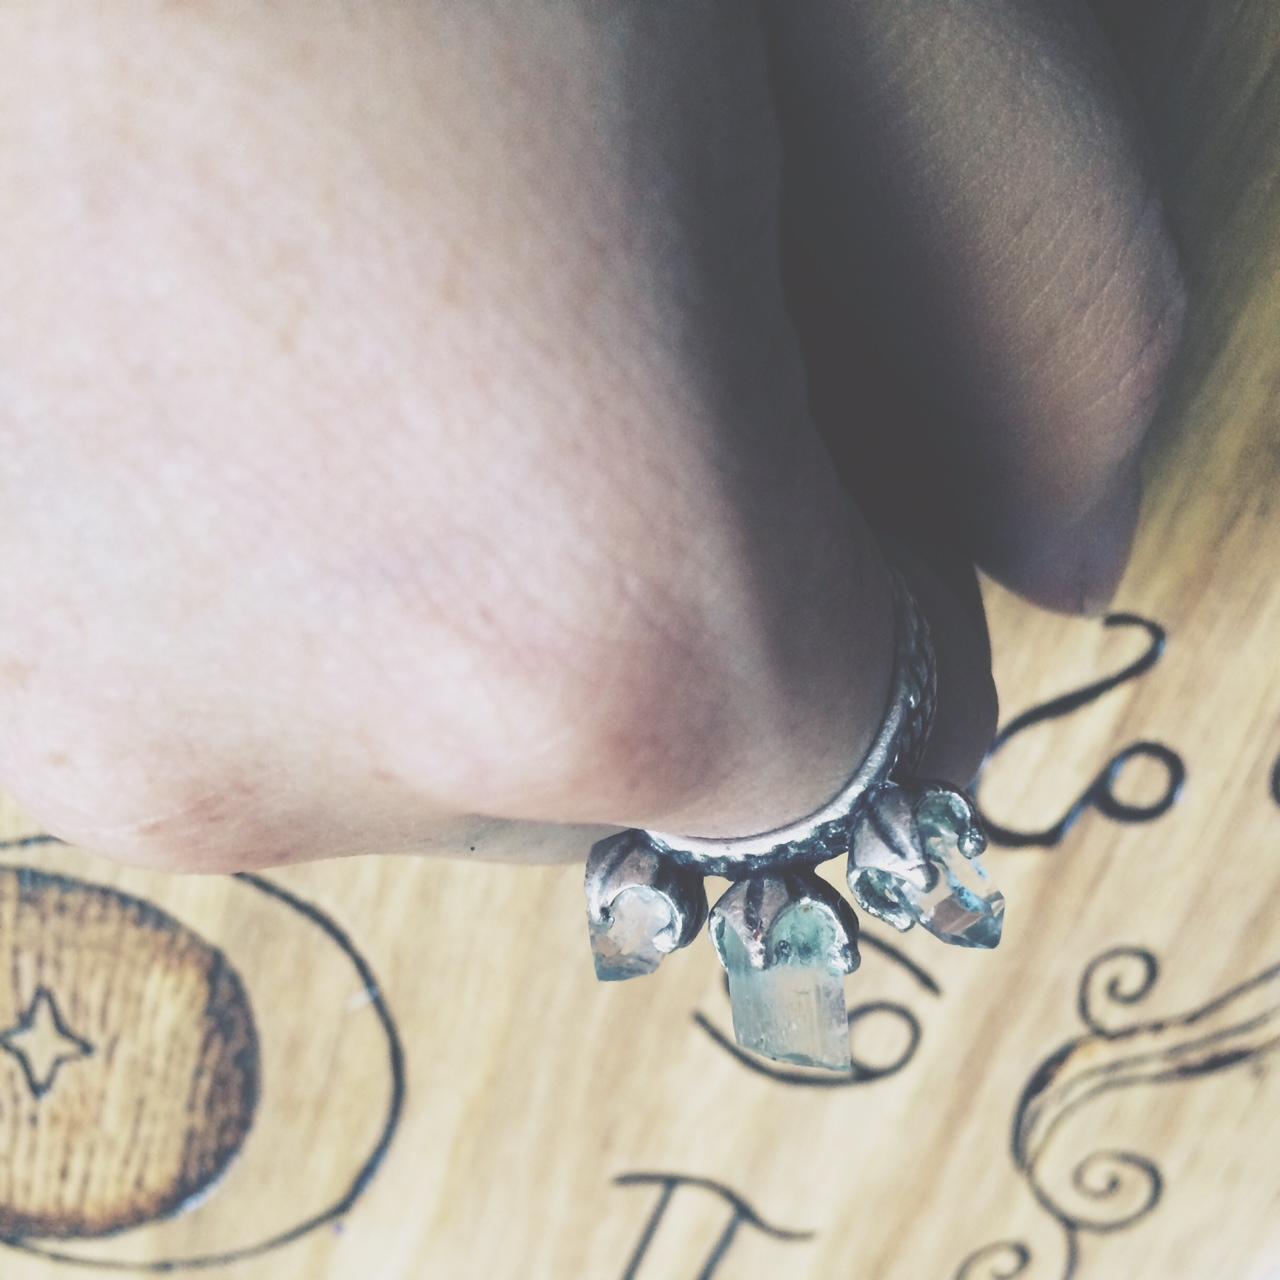 Aquamarine (center stone) and Herkimer Diamond ring from The Uncommon Wren